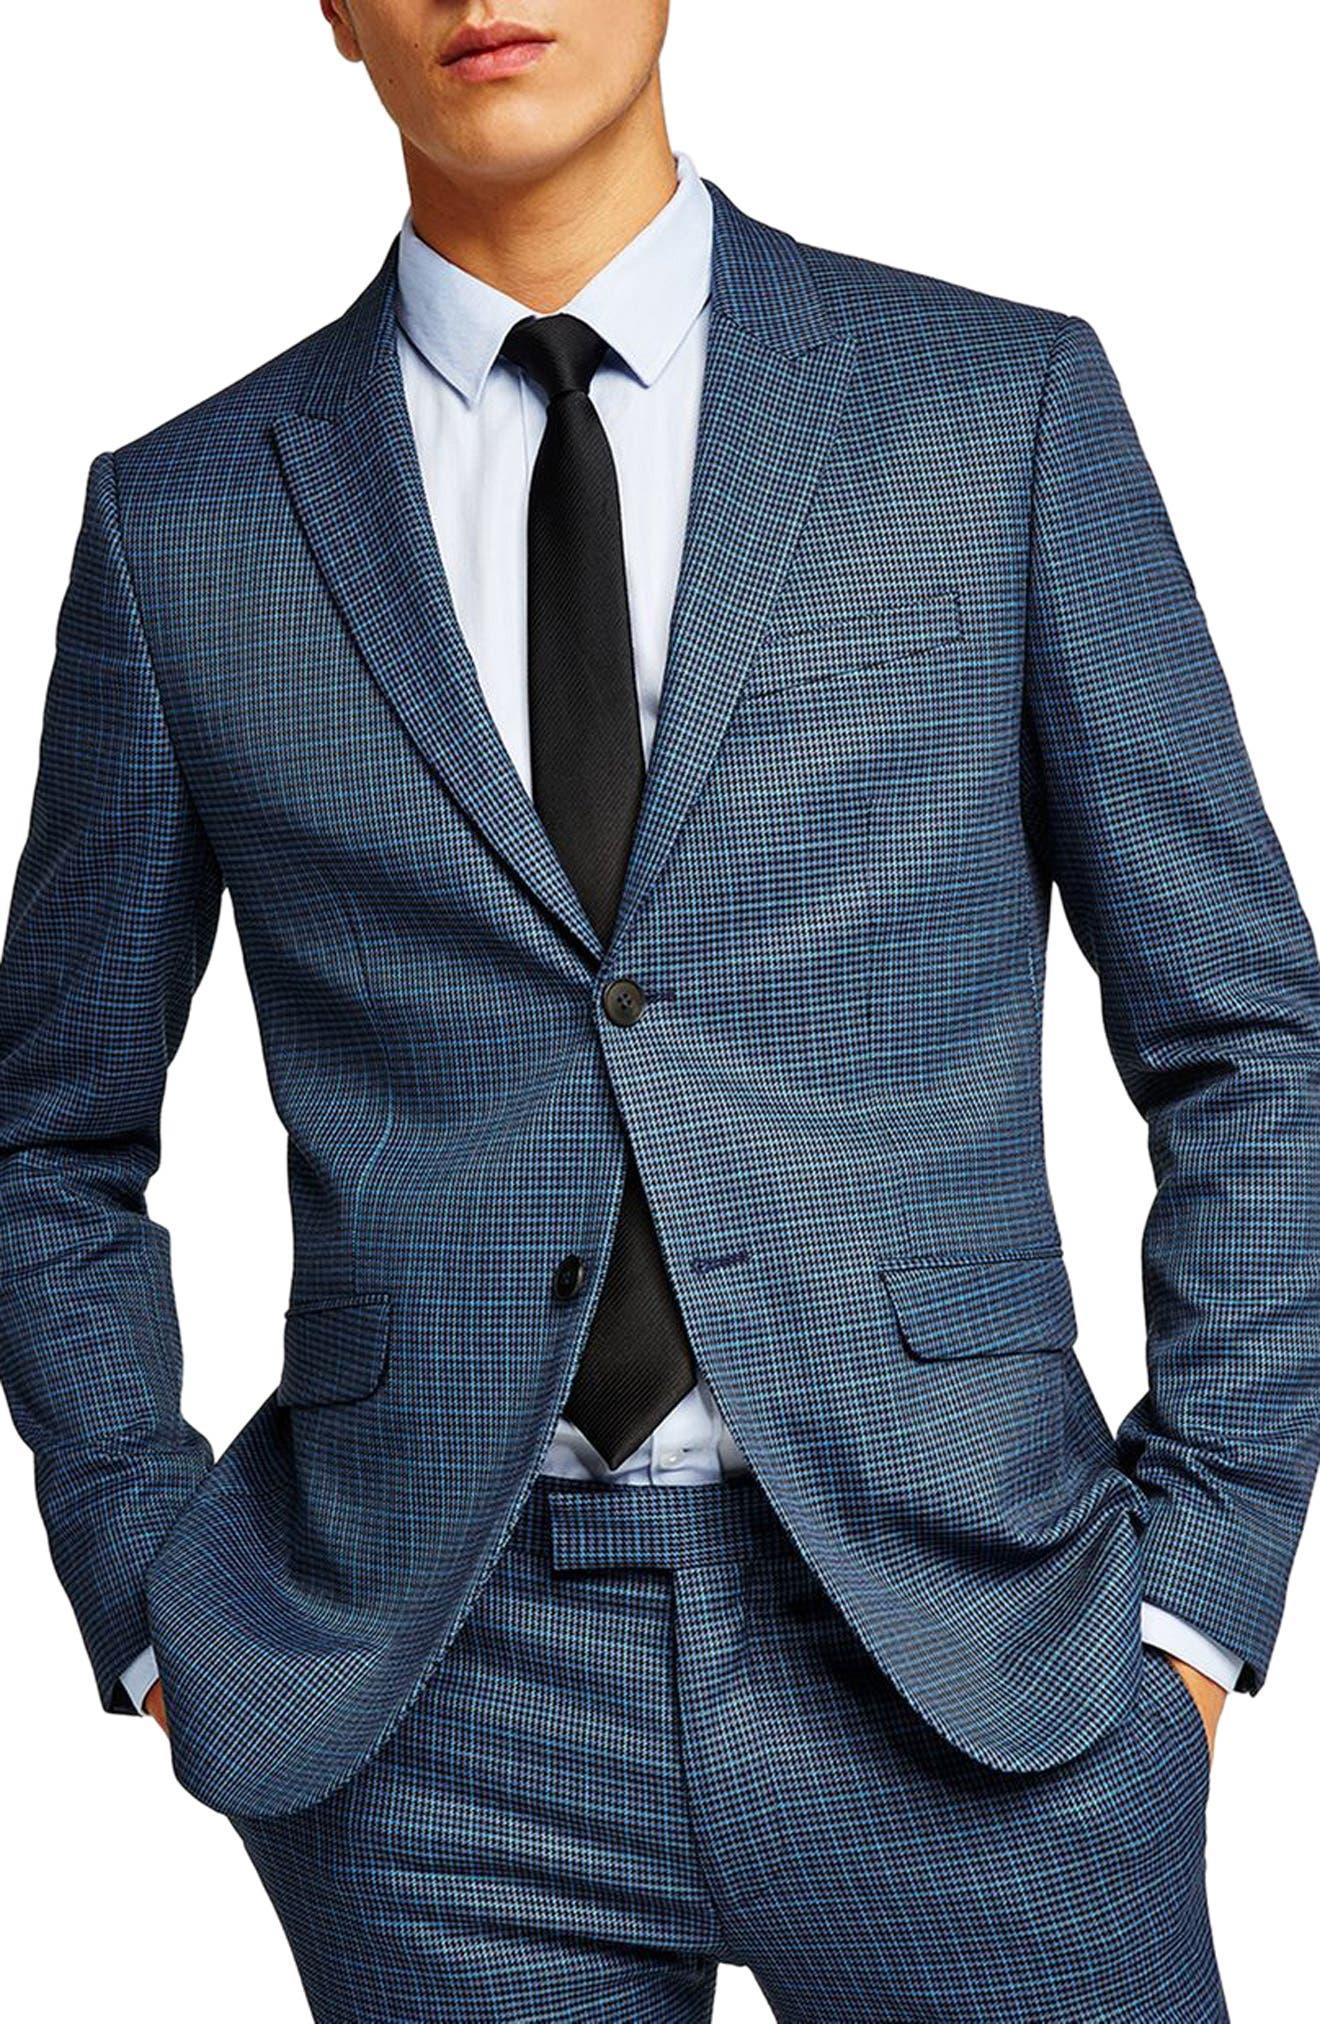 Alternate Image 1 Selected - Topman Check Skinny Fit Suit Jacket